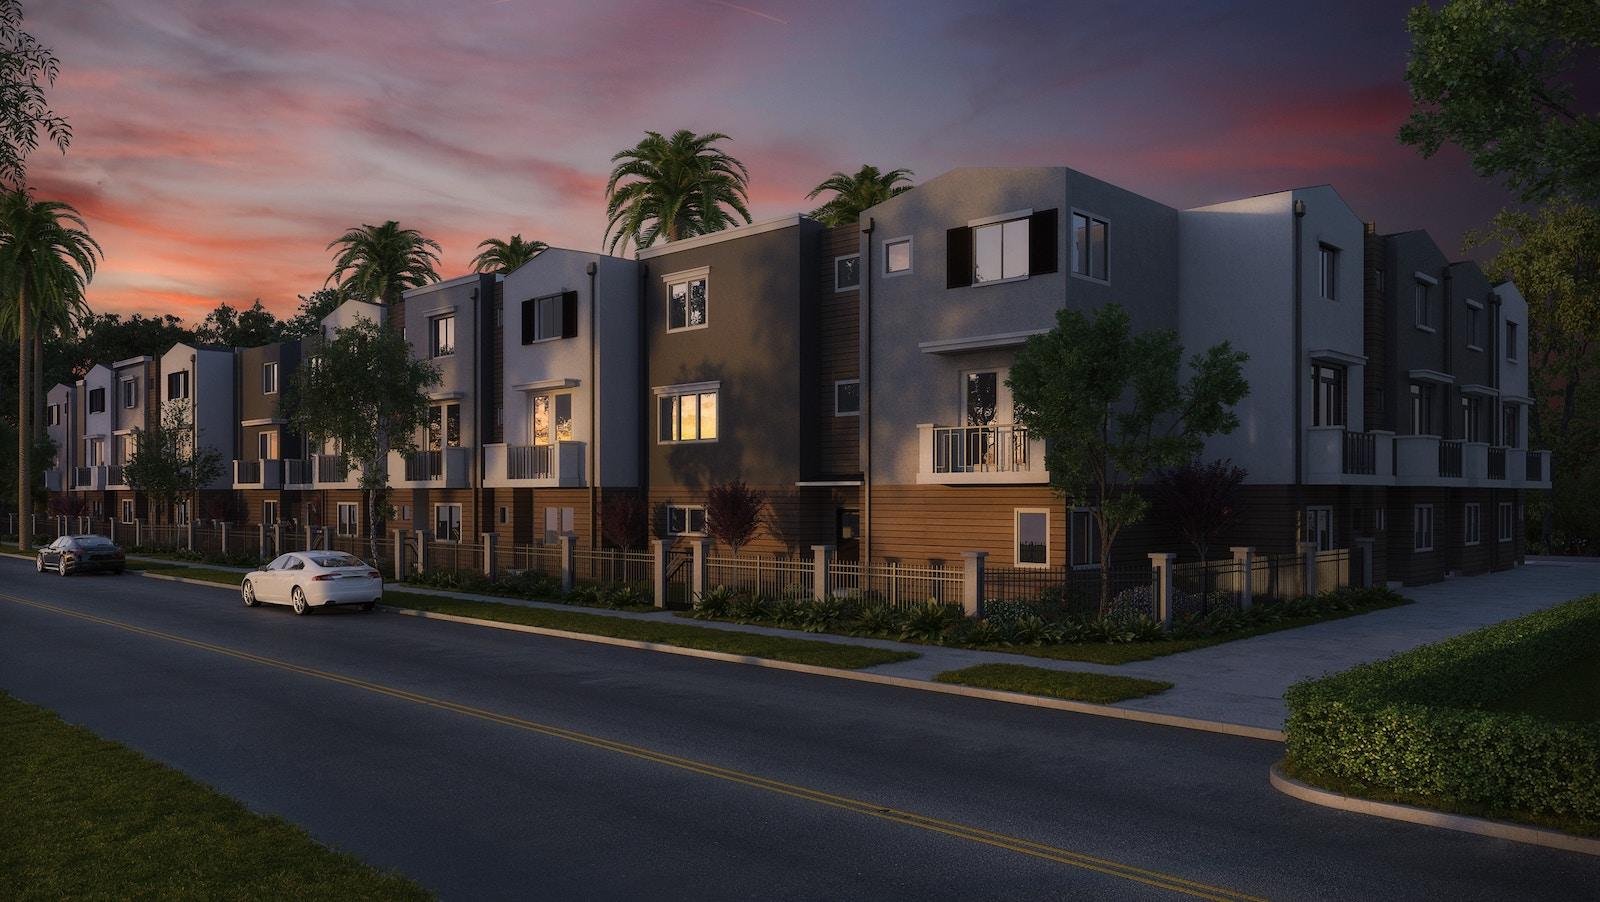 Cost Segregation of Rental Property